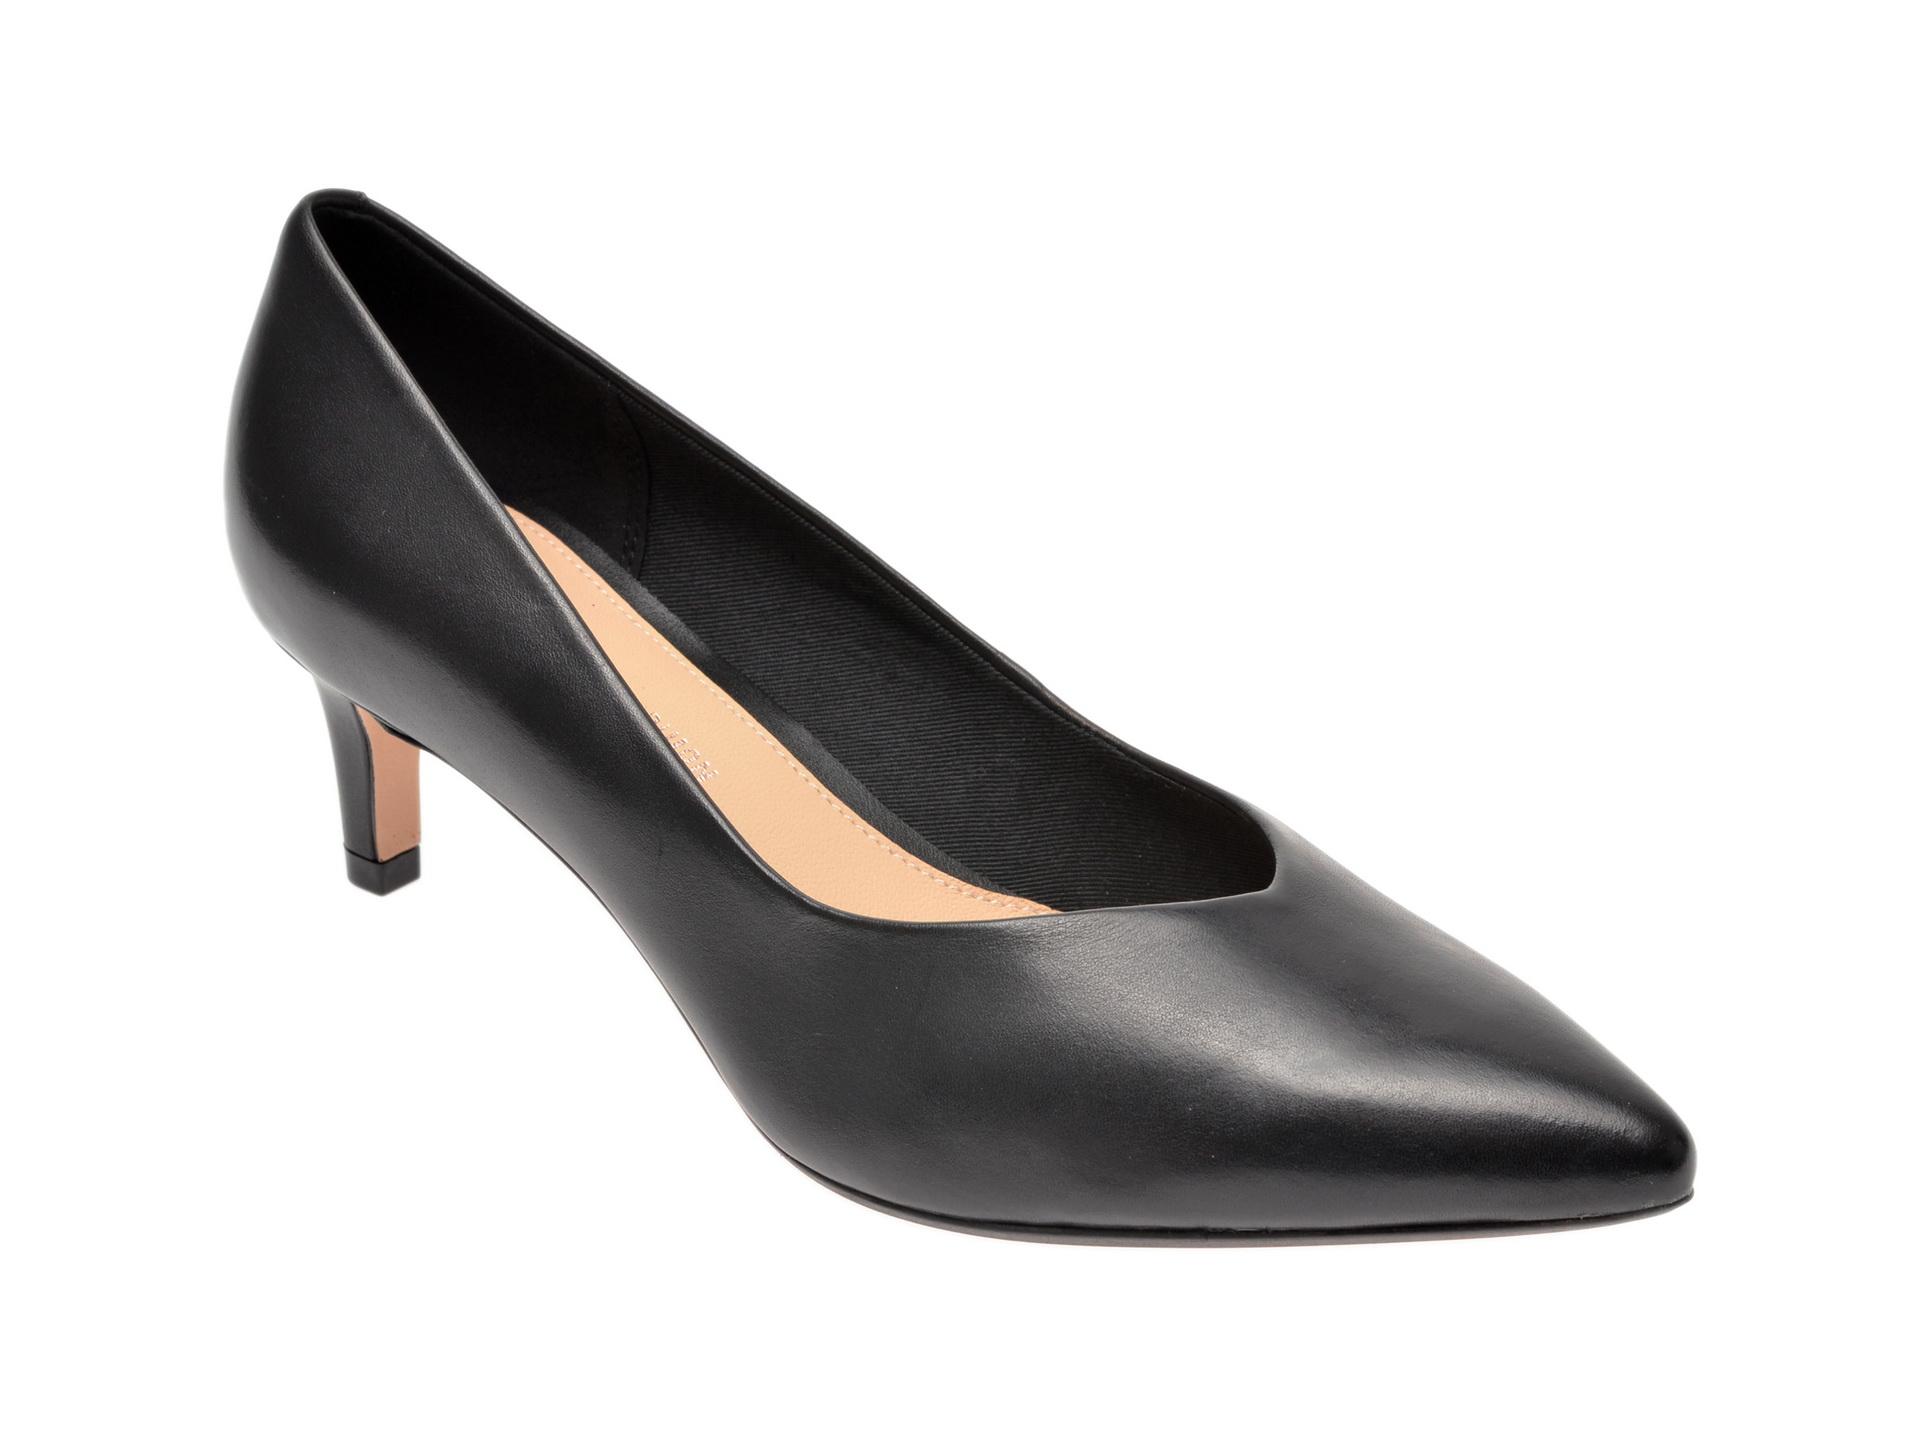 Pantofi CLARKS negri, Laina55 Court, din piele naturala